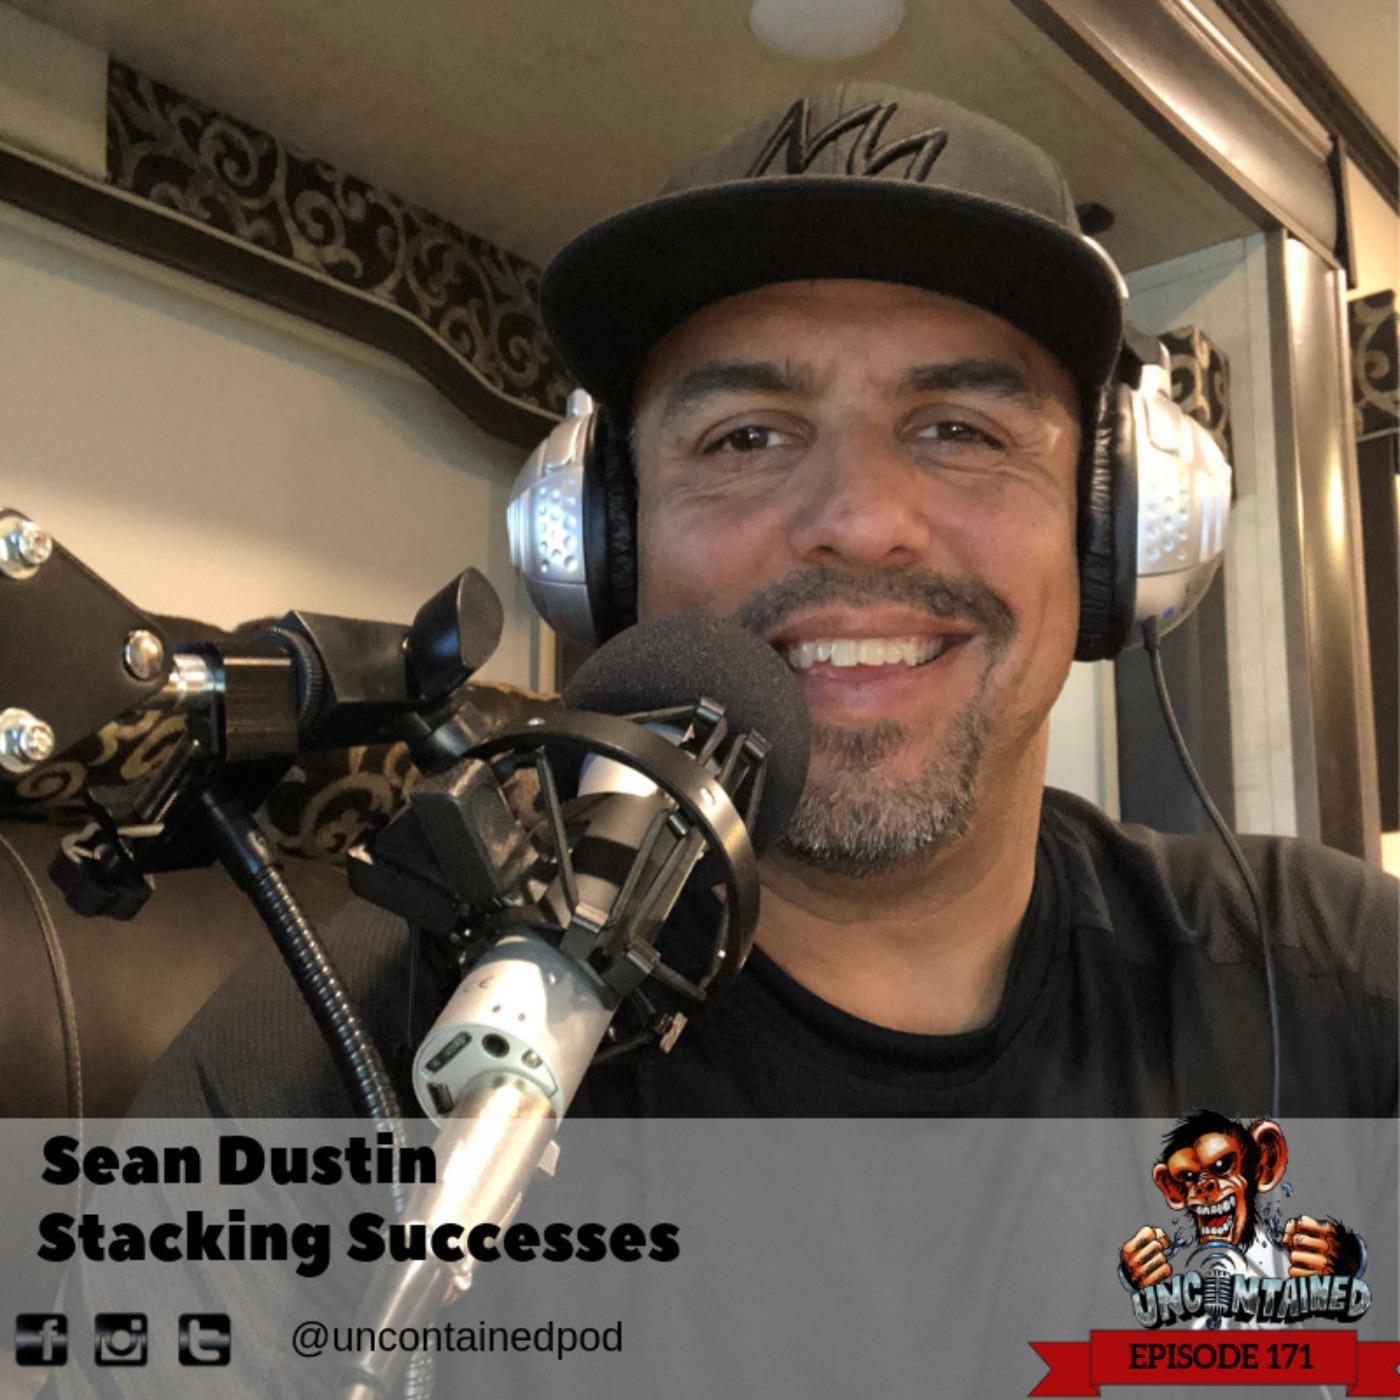 Episode 171: Sean Dustin - Stacking Successes